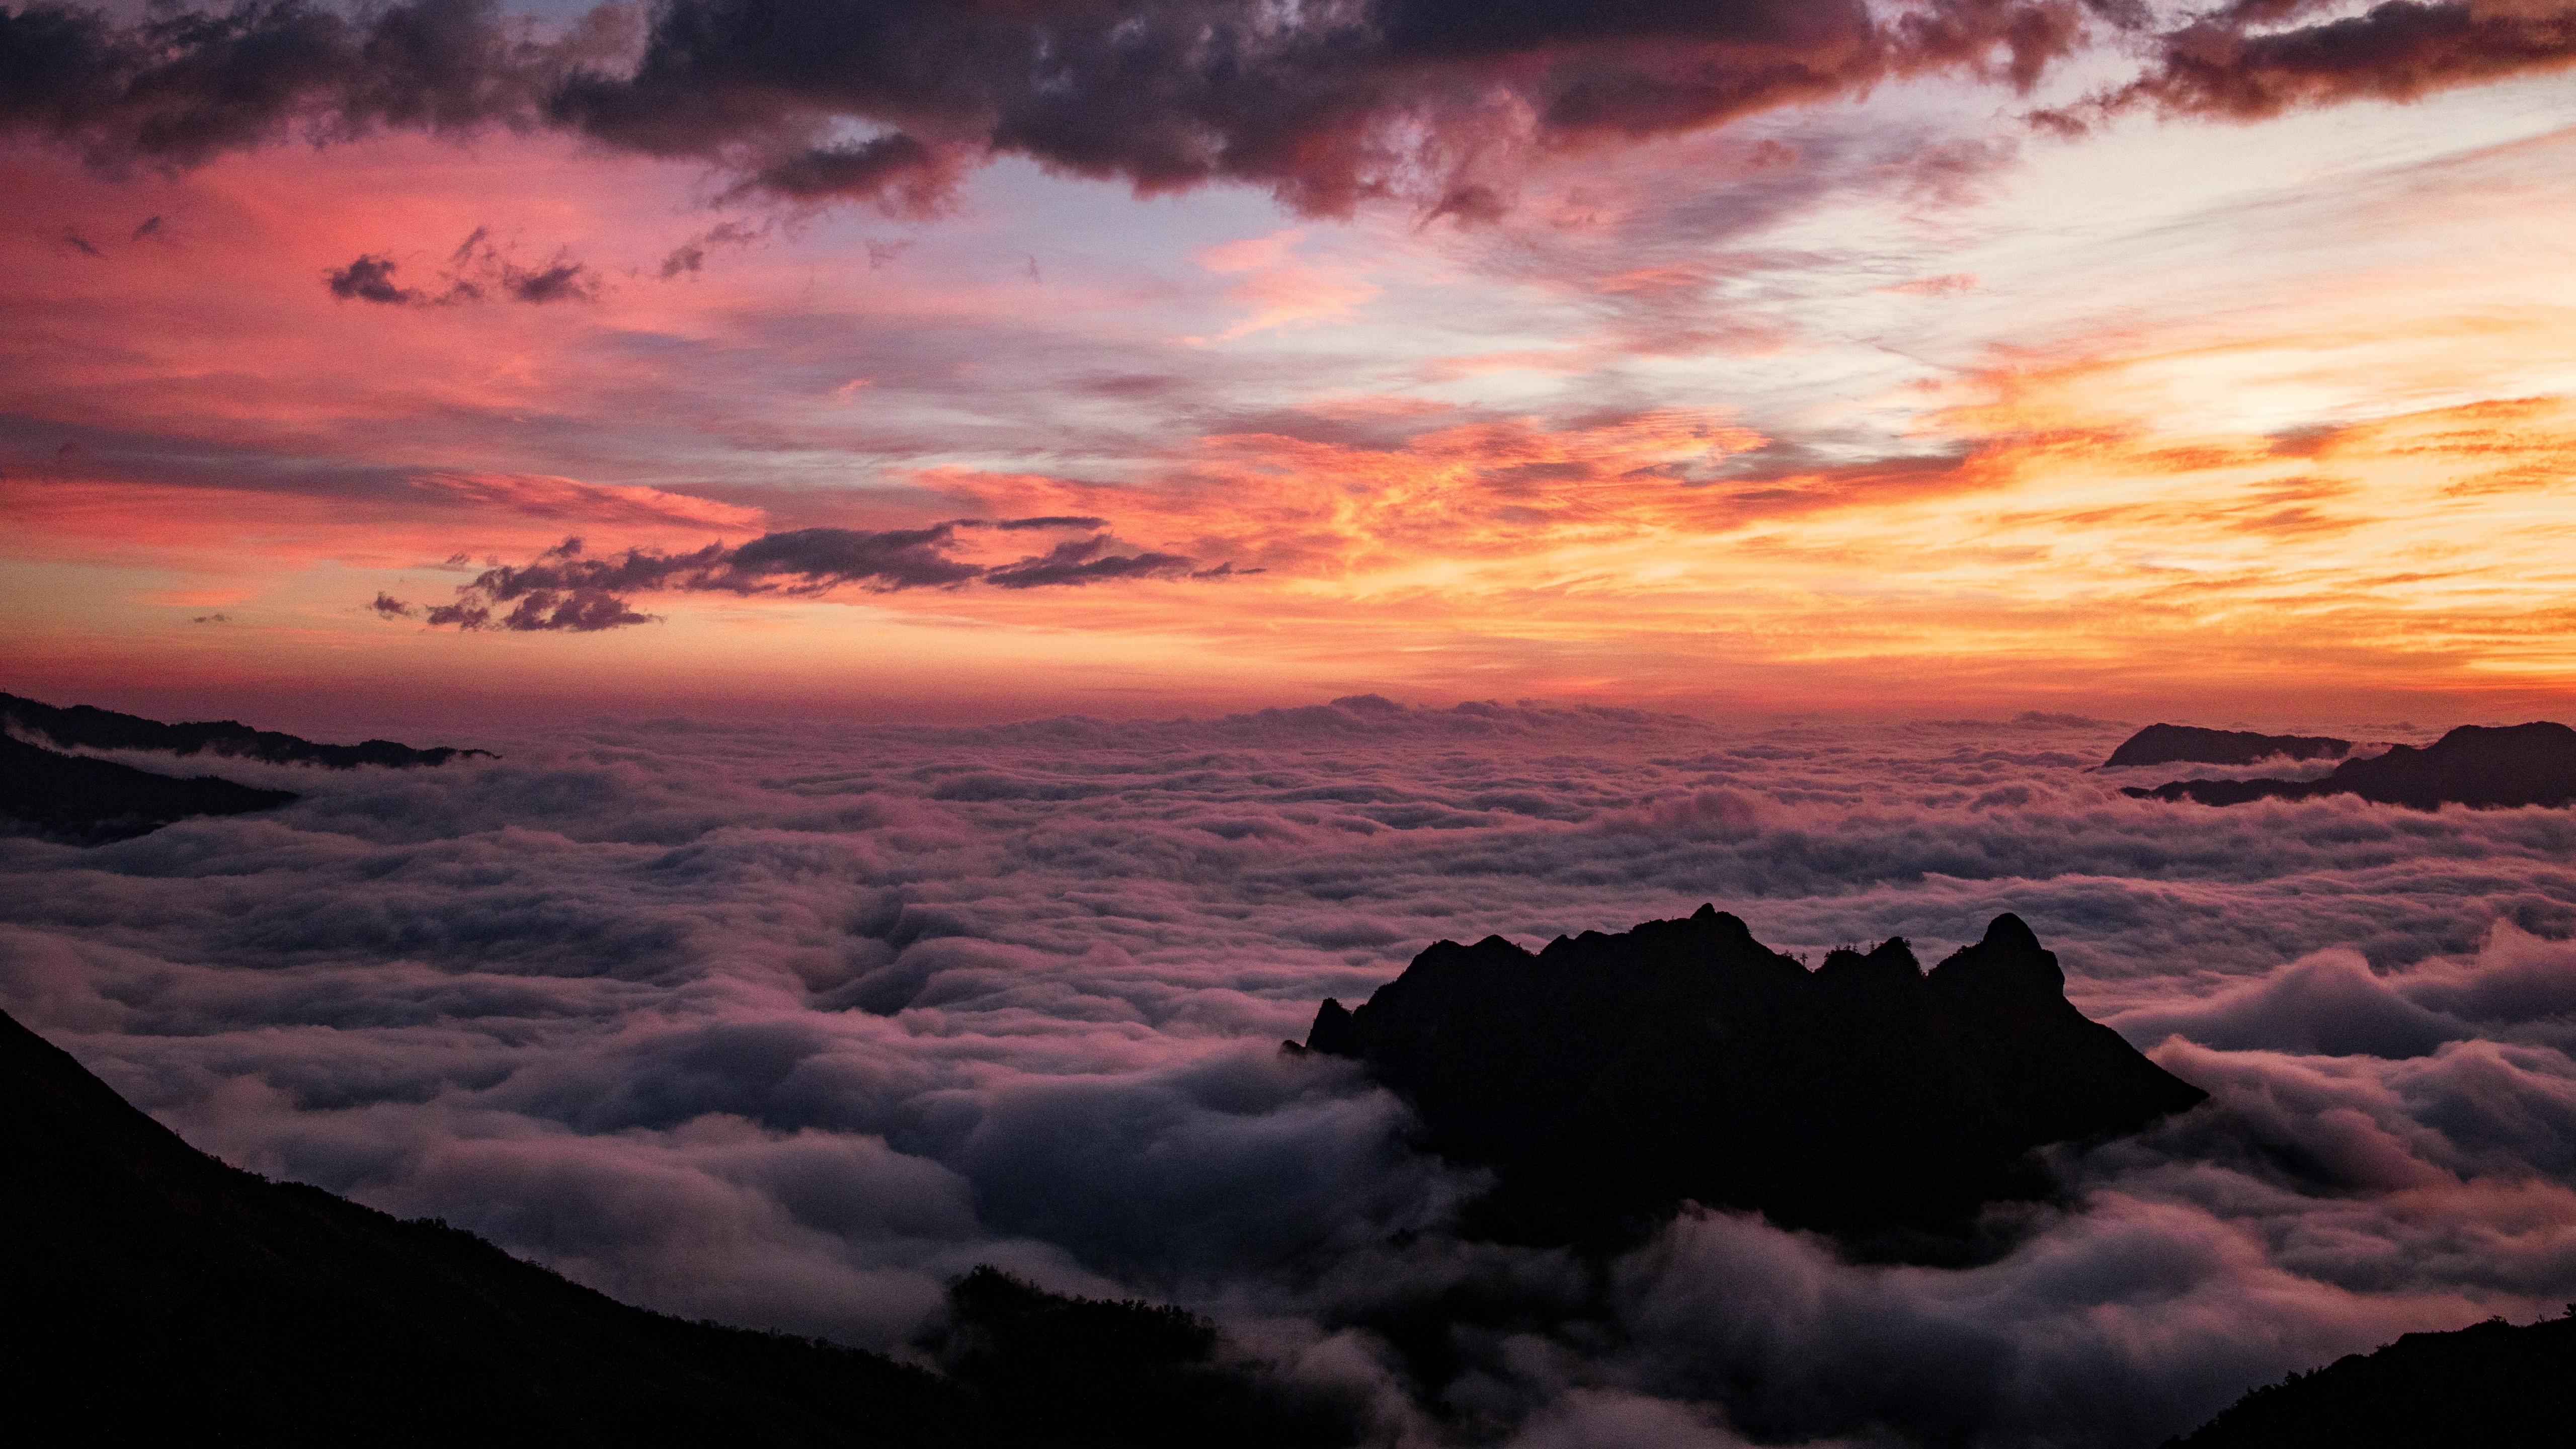 Sea of clouds wallpaper